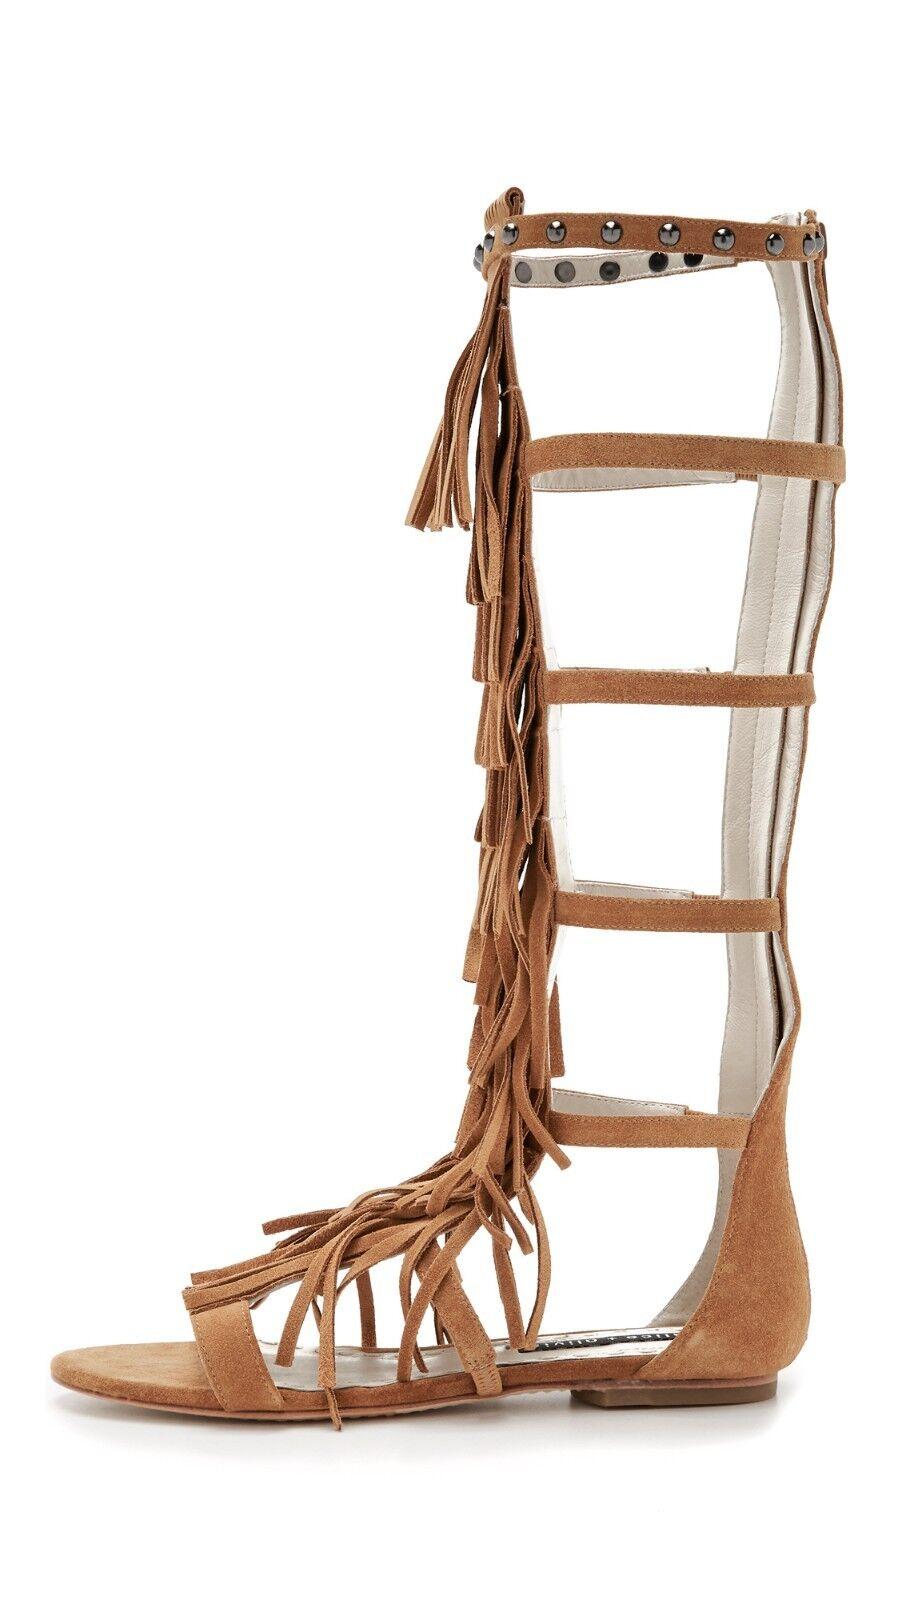 NIB  398 Alice Olivia Paula Suede Fringe Gladiator  Sandal (US 6.5) EU 36.5  acquista la qualità autentica al 100%